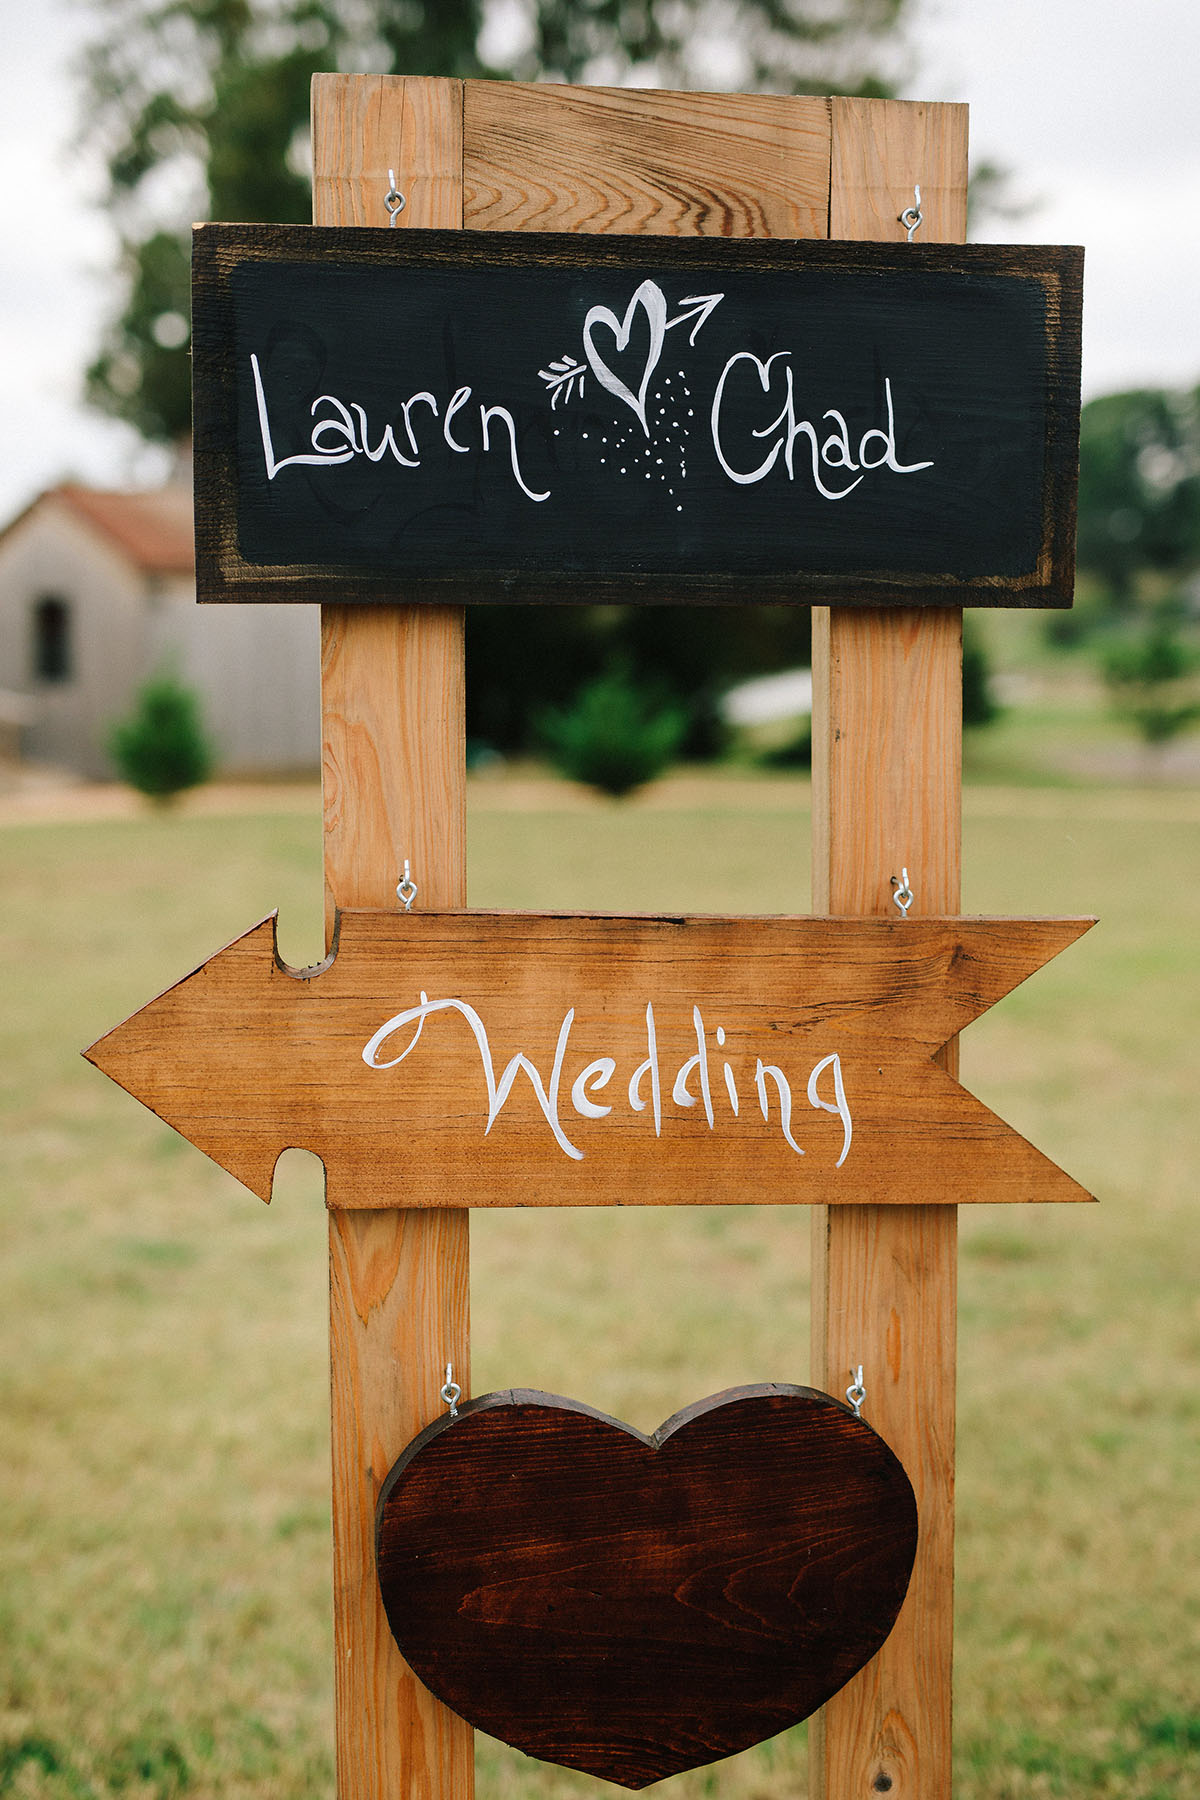 lauren_chad_wedding-2.jpg